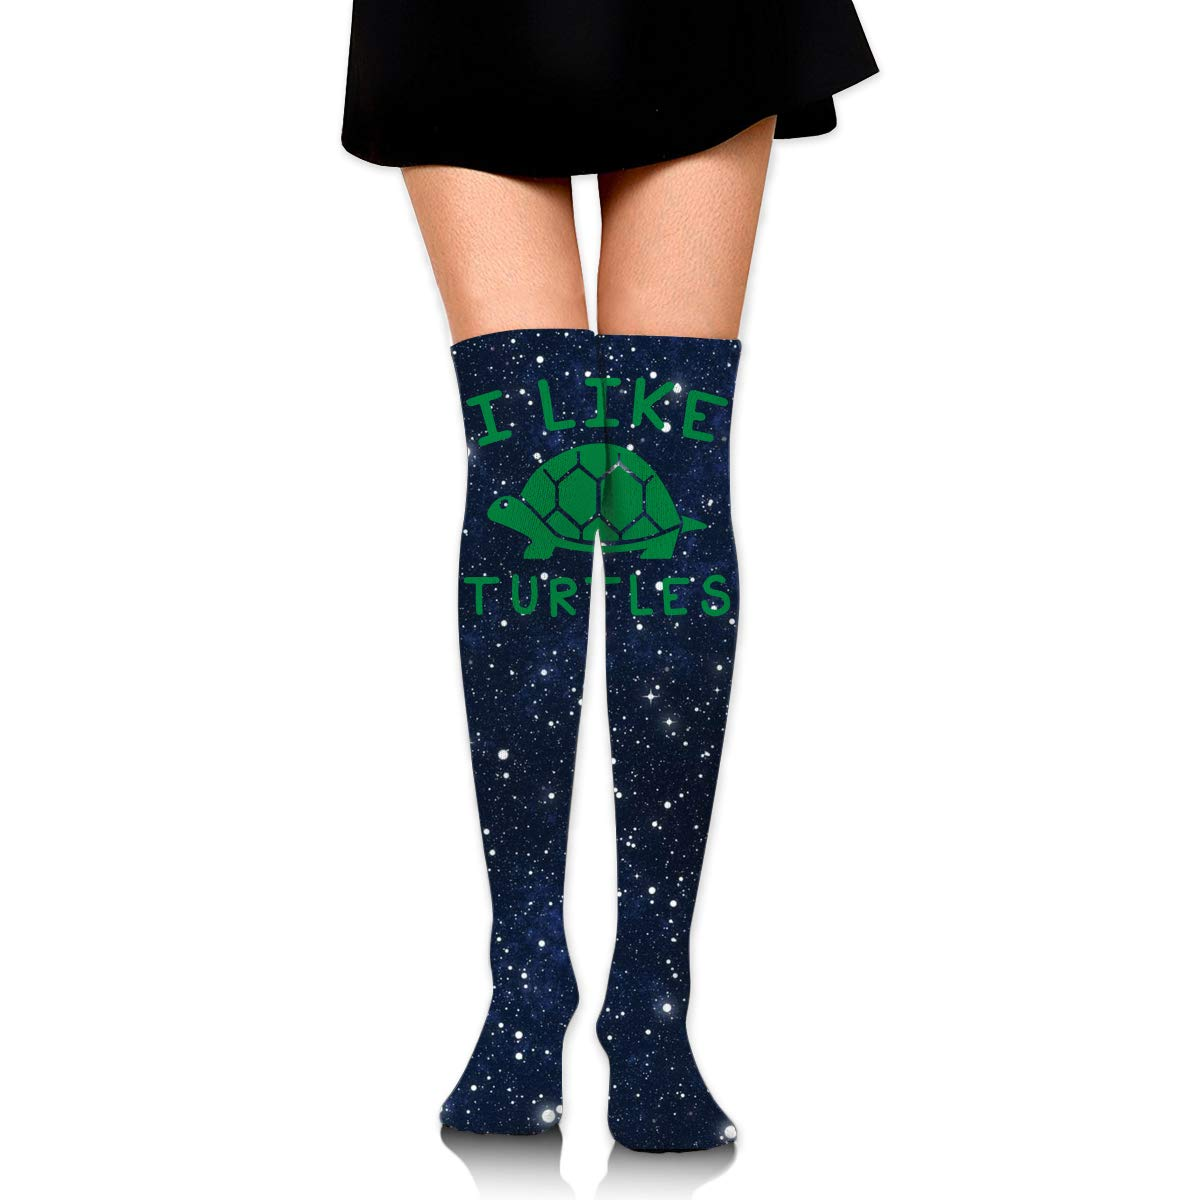 One Size Girls Womens I Like Turtles Over Knee Thigh High Stockings Fashion Socks